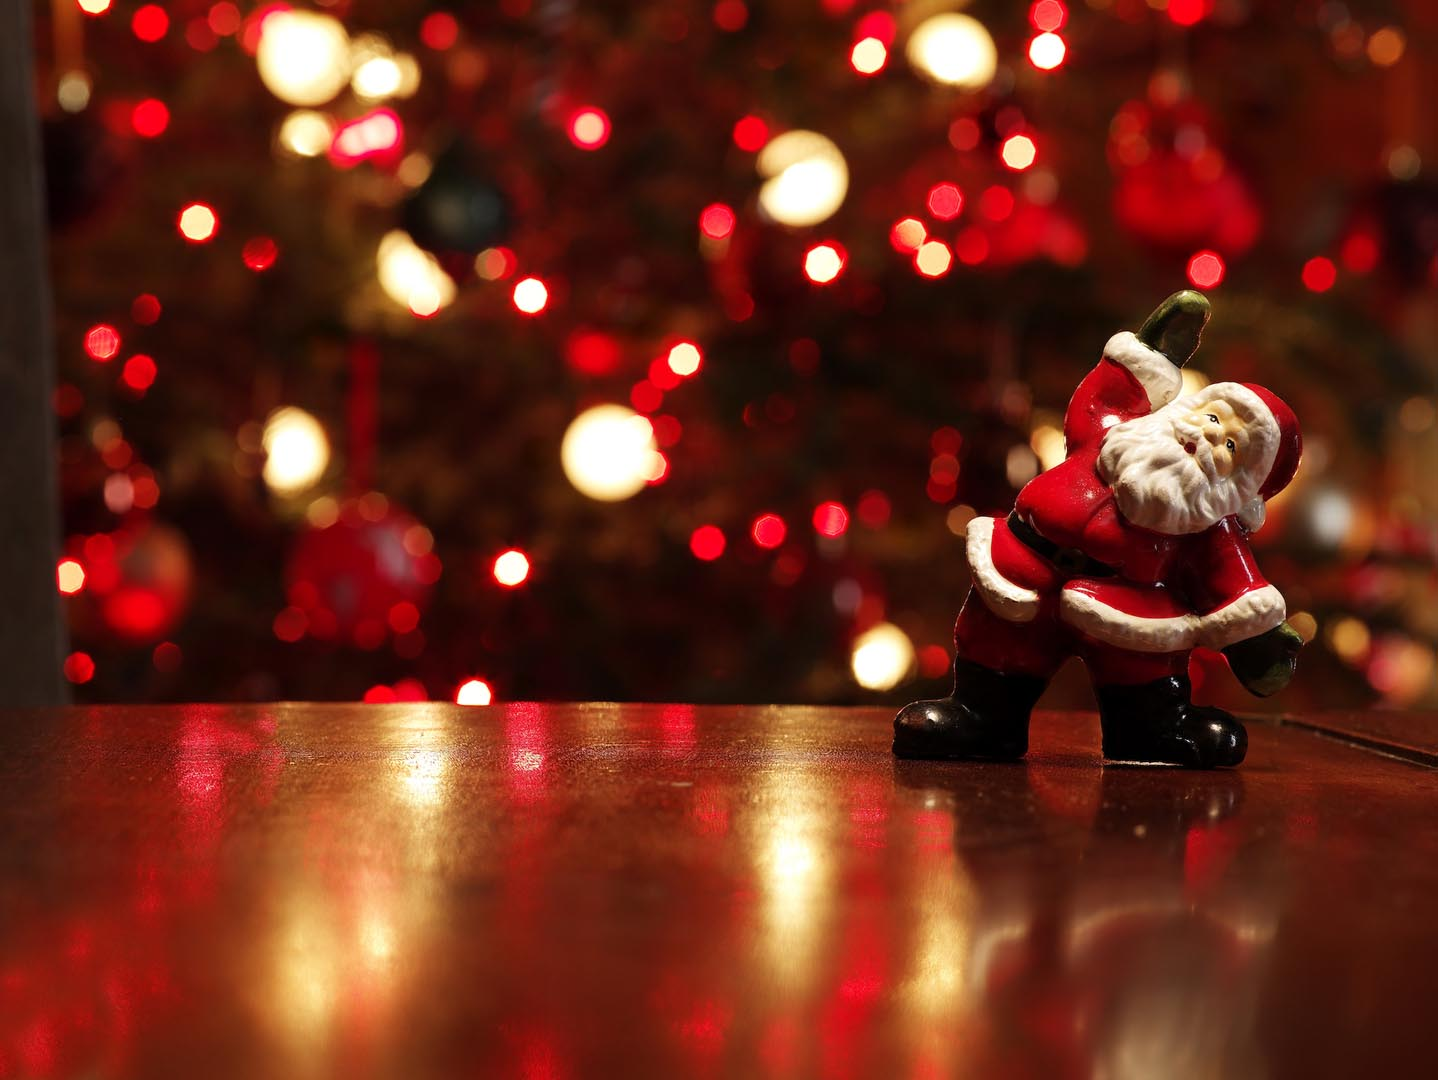 Marketing Through Feeling & Emotion at Christmas